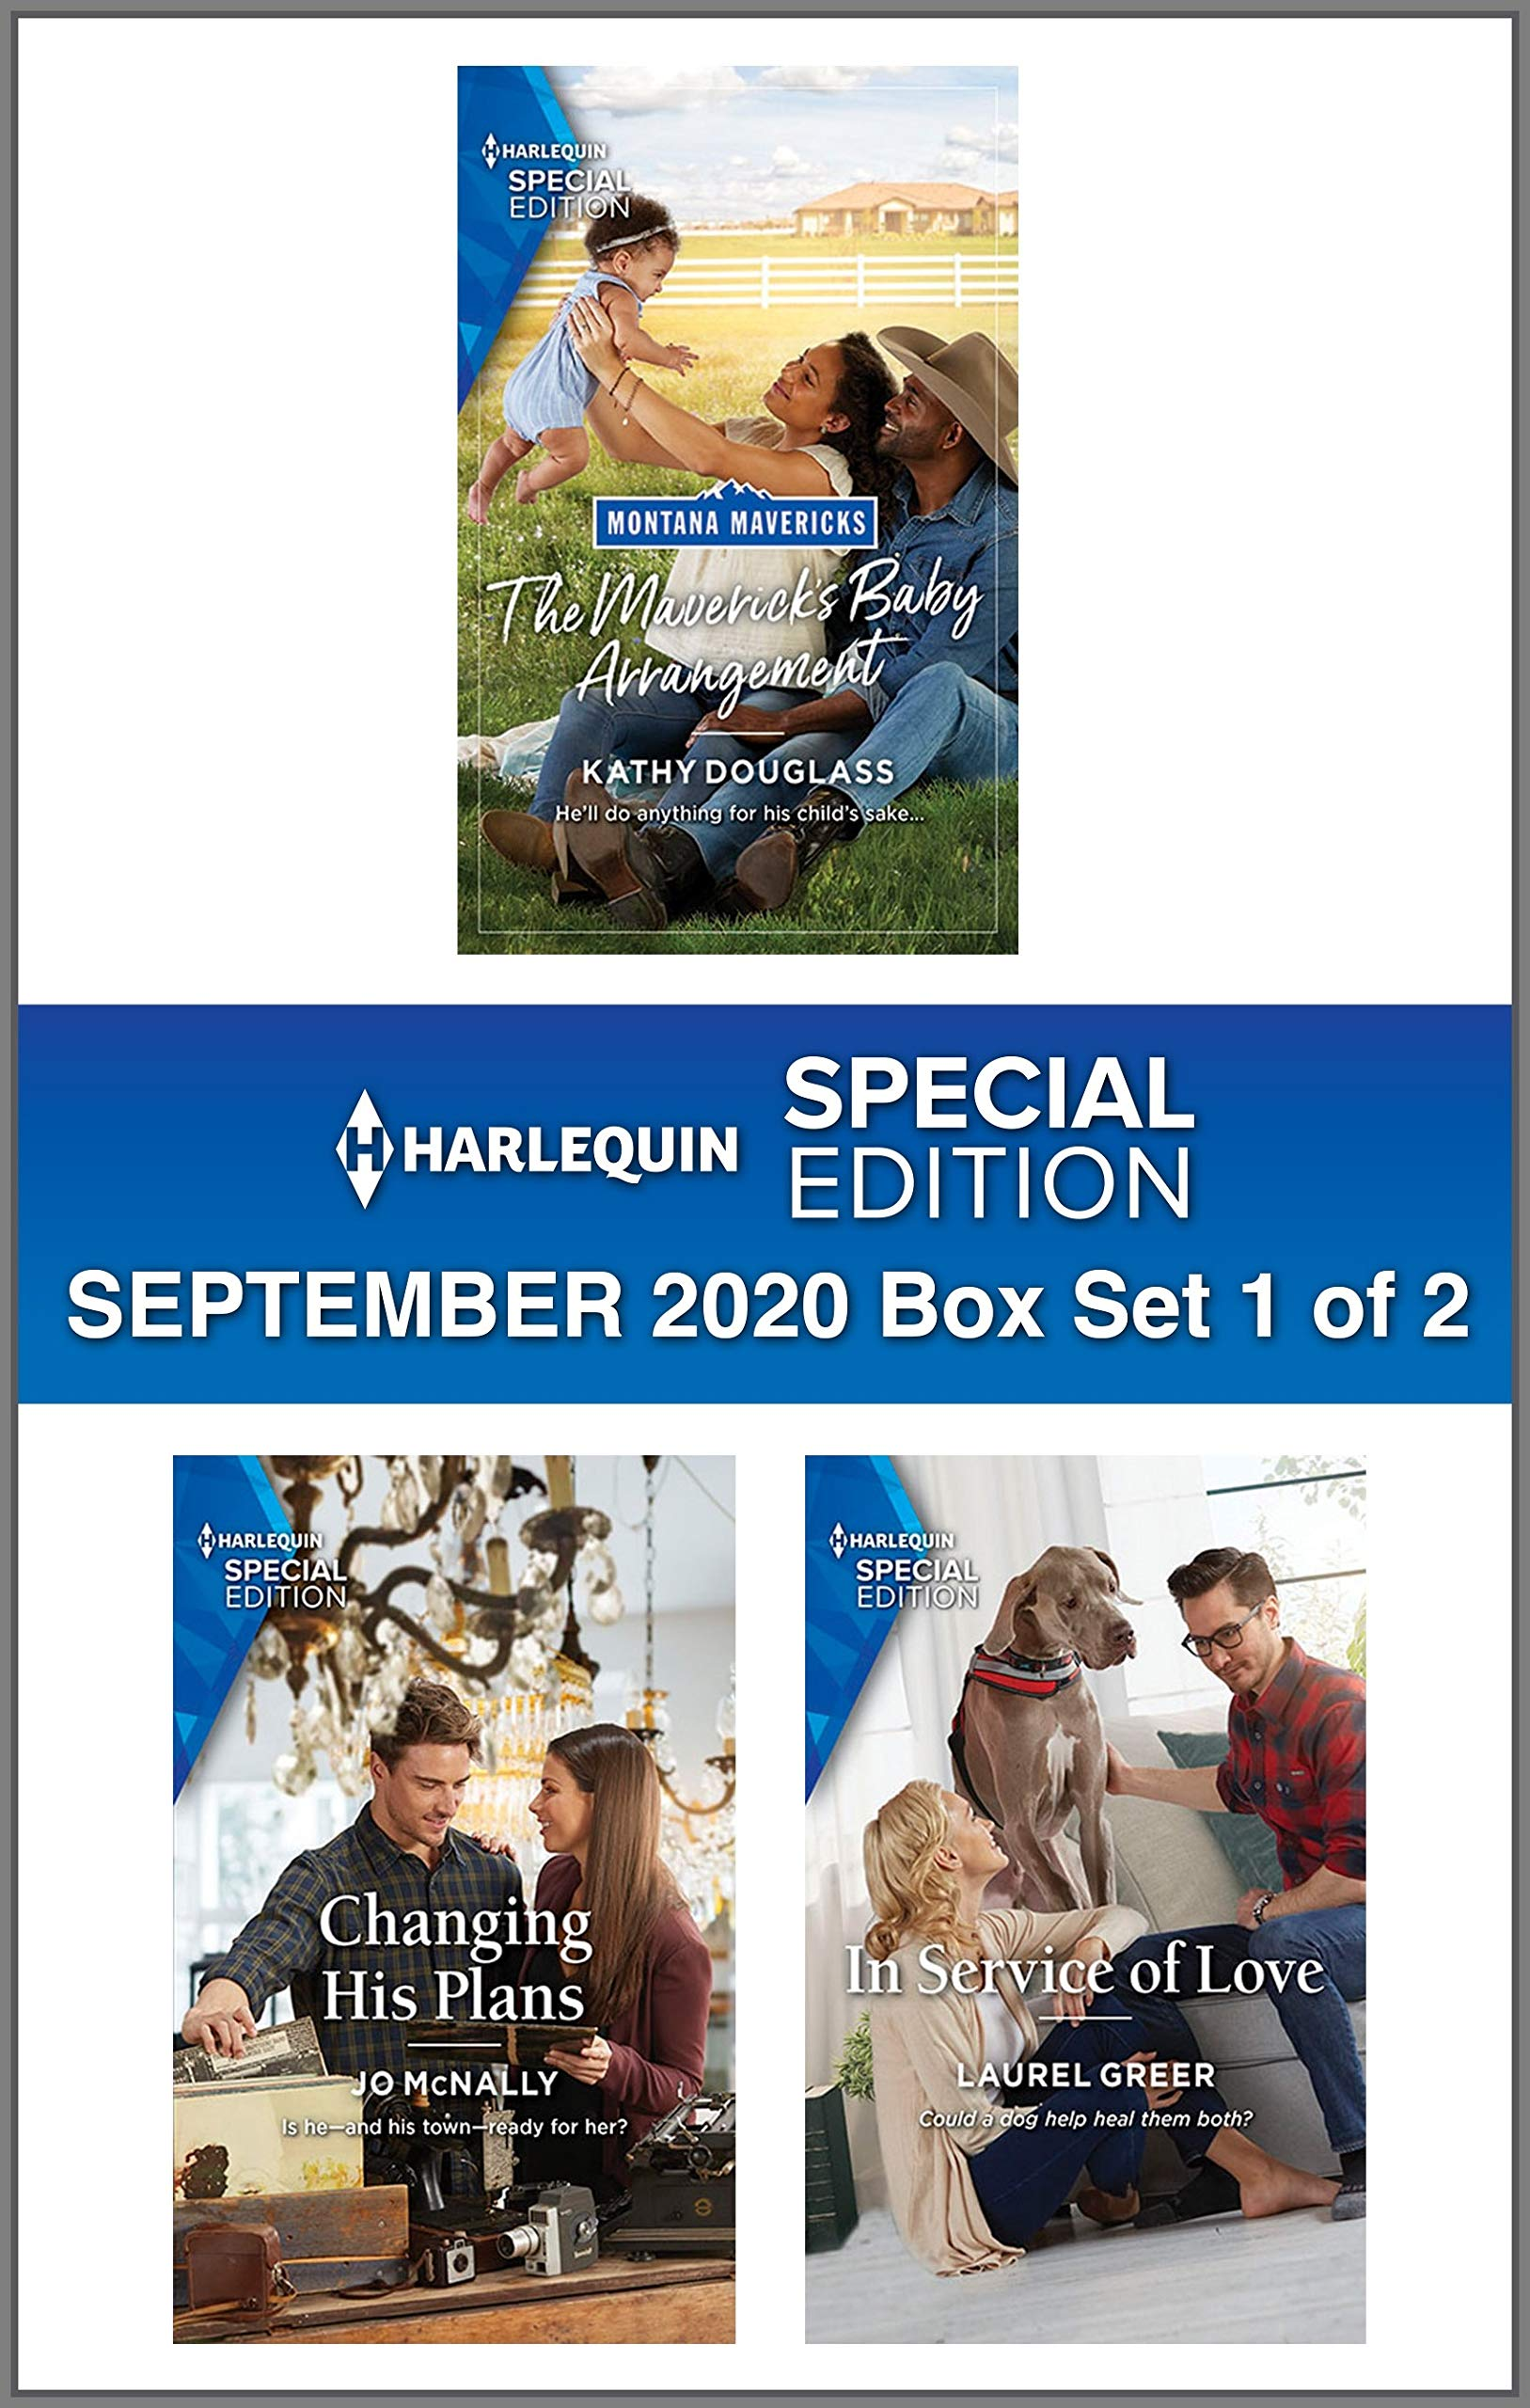 Harlequin Special Edition September 2020 - Box Set 1 of 2